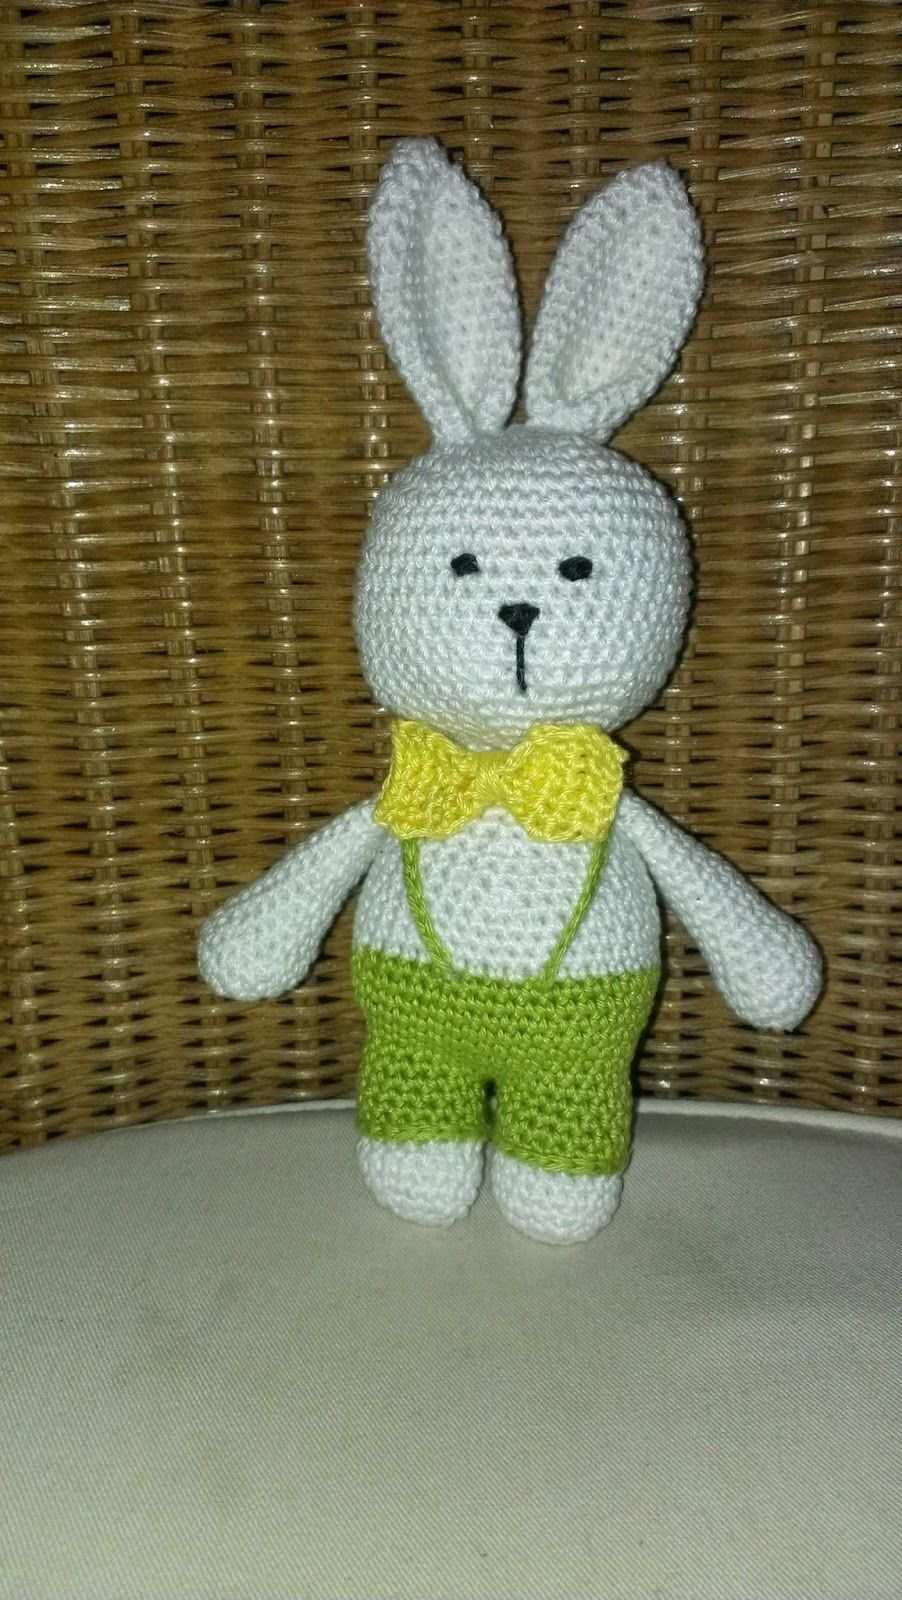 Amigurumi Hakeln Crochet Kostenlos Free Hase Ostern Bunny Easter Kaninchen Hakeln Tier Hakeln Kostenlos Hakeln Ostern